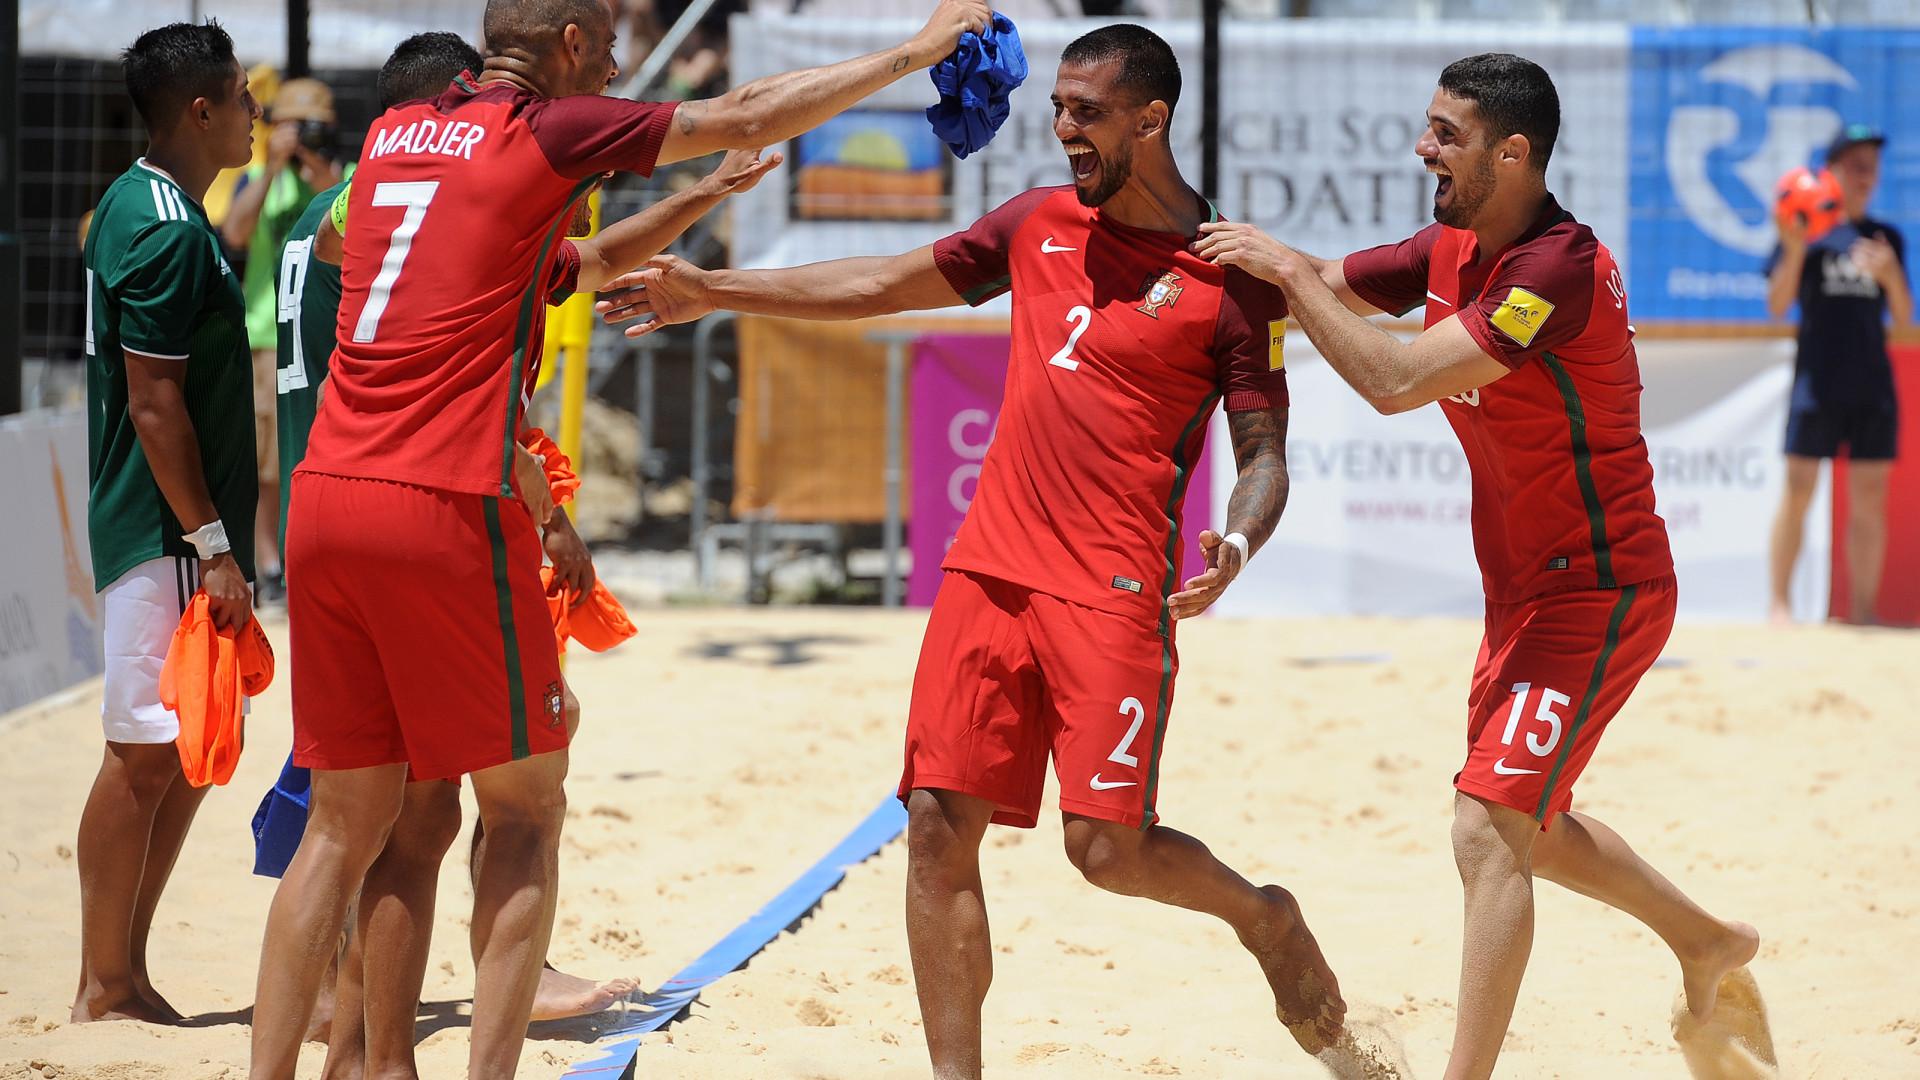 Futebol de praia figueira da foz